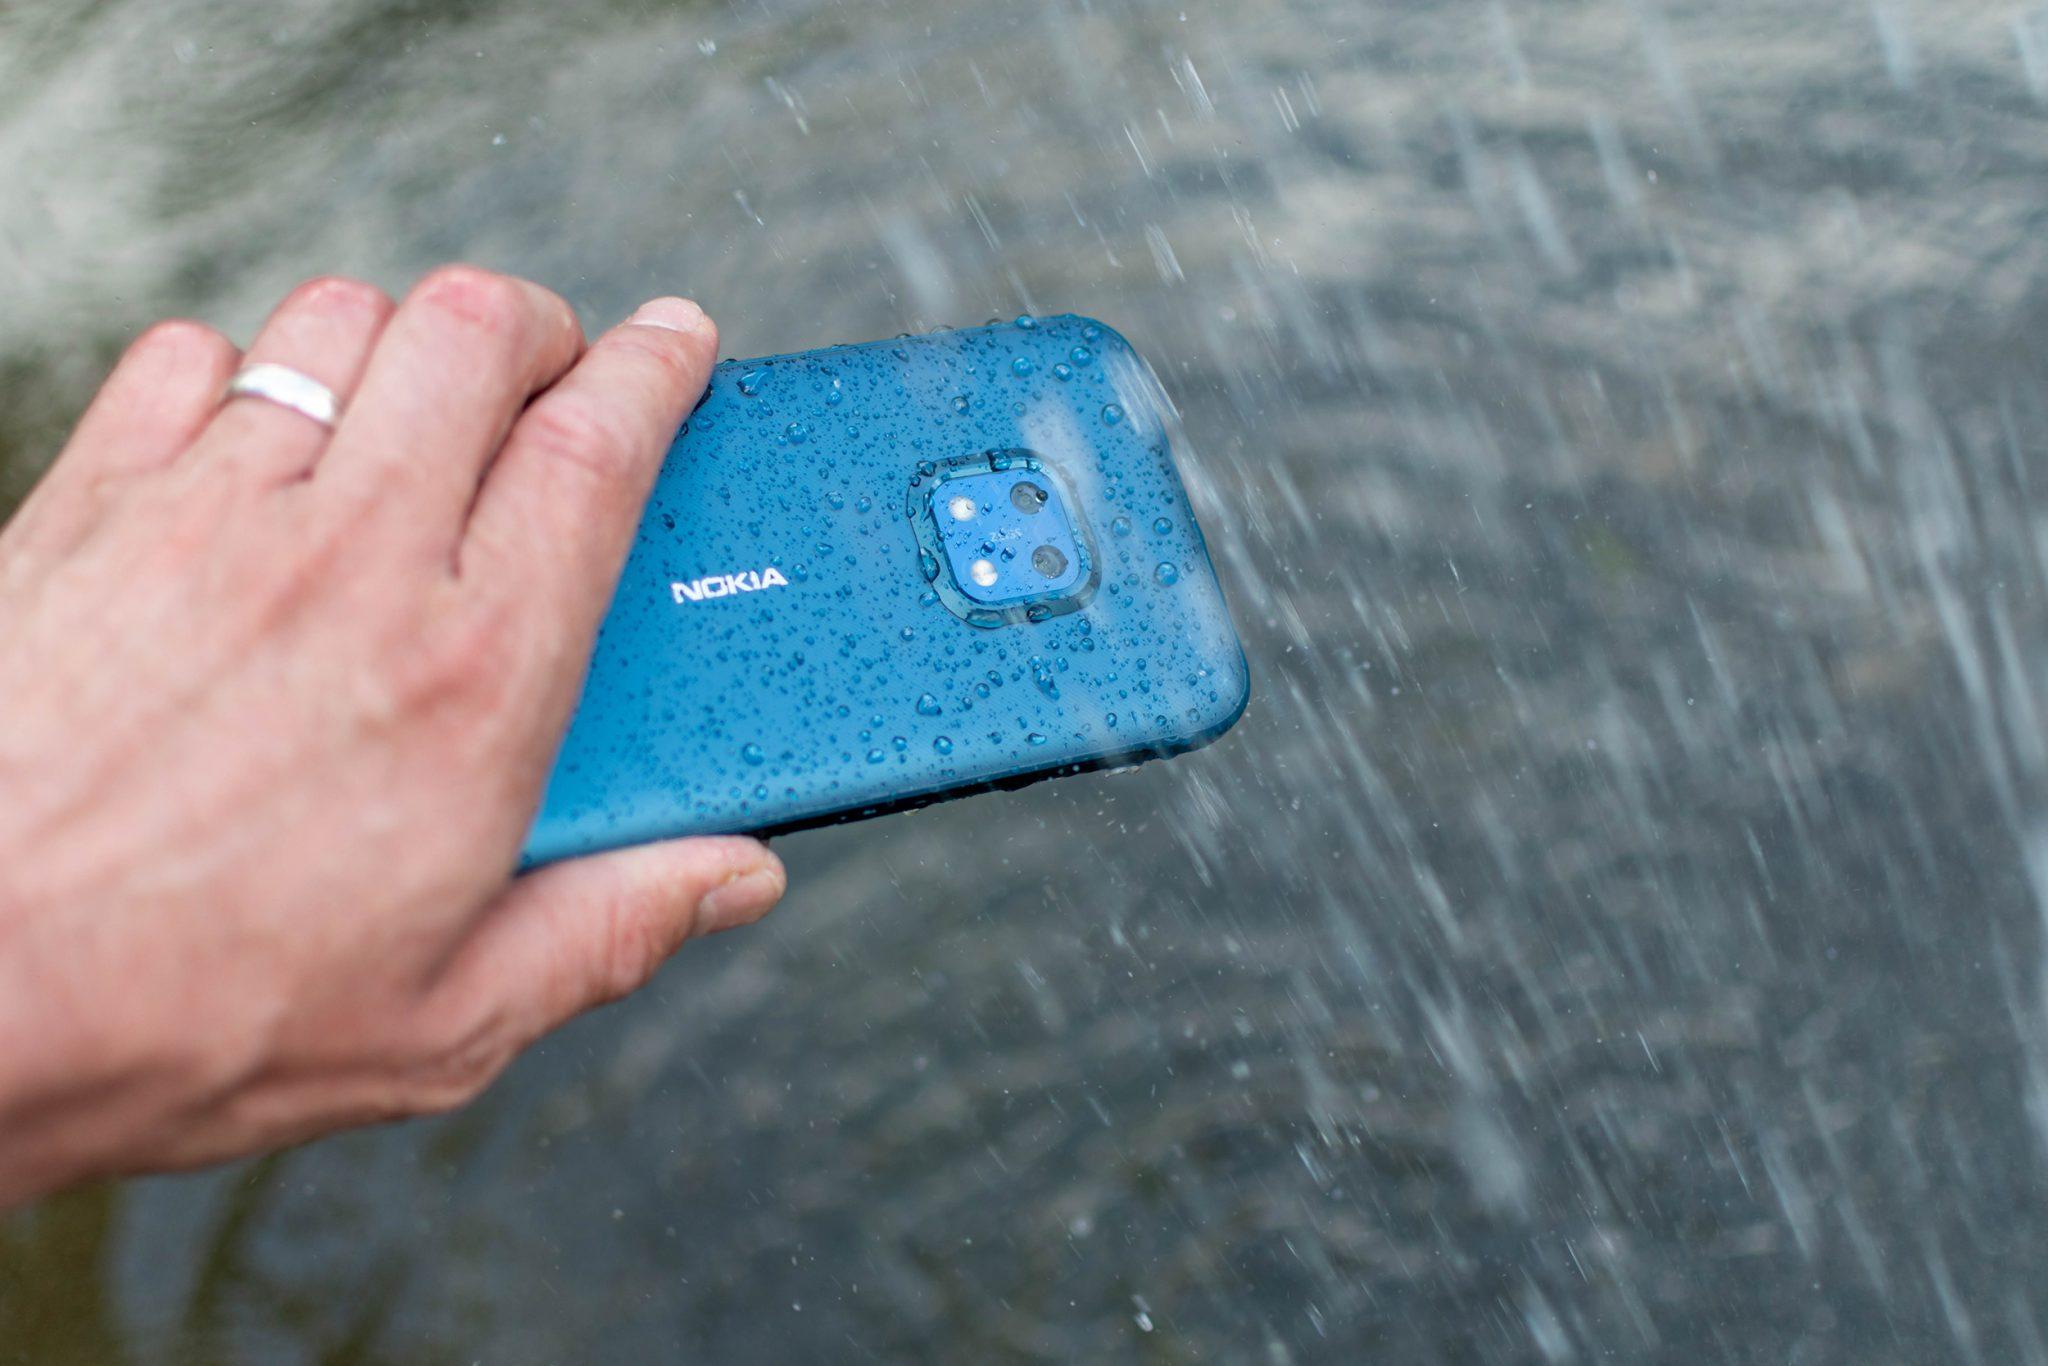 robustes smartphone: nokia xr20 im test